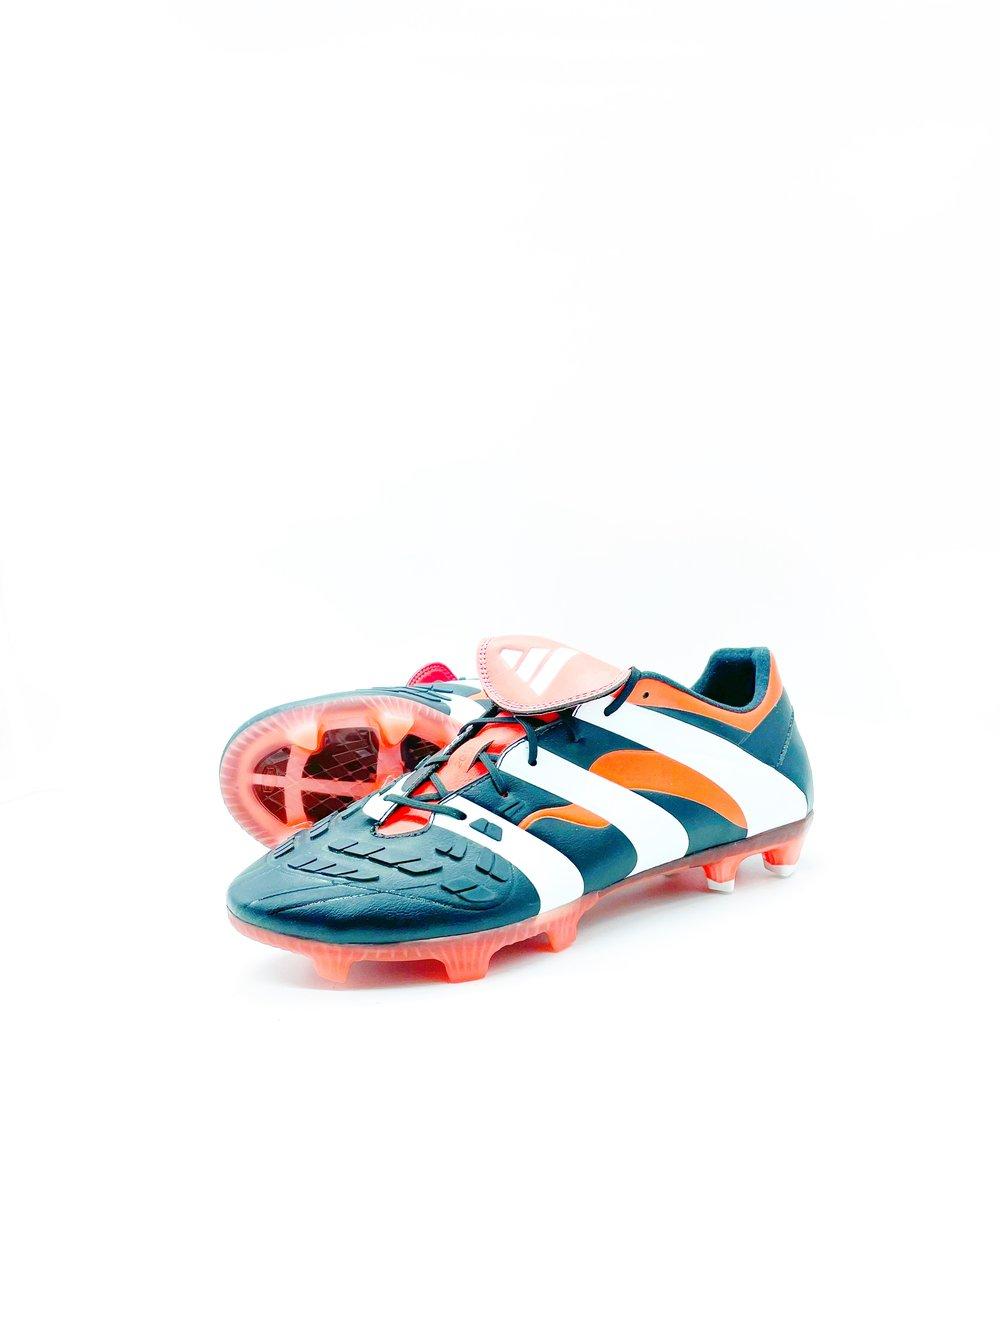 Image of Adidas predator Accelerator FG Remake